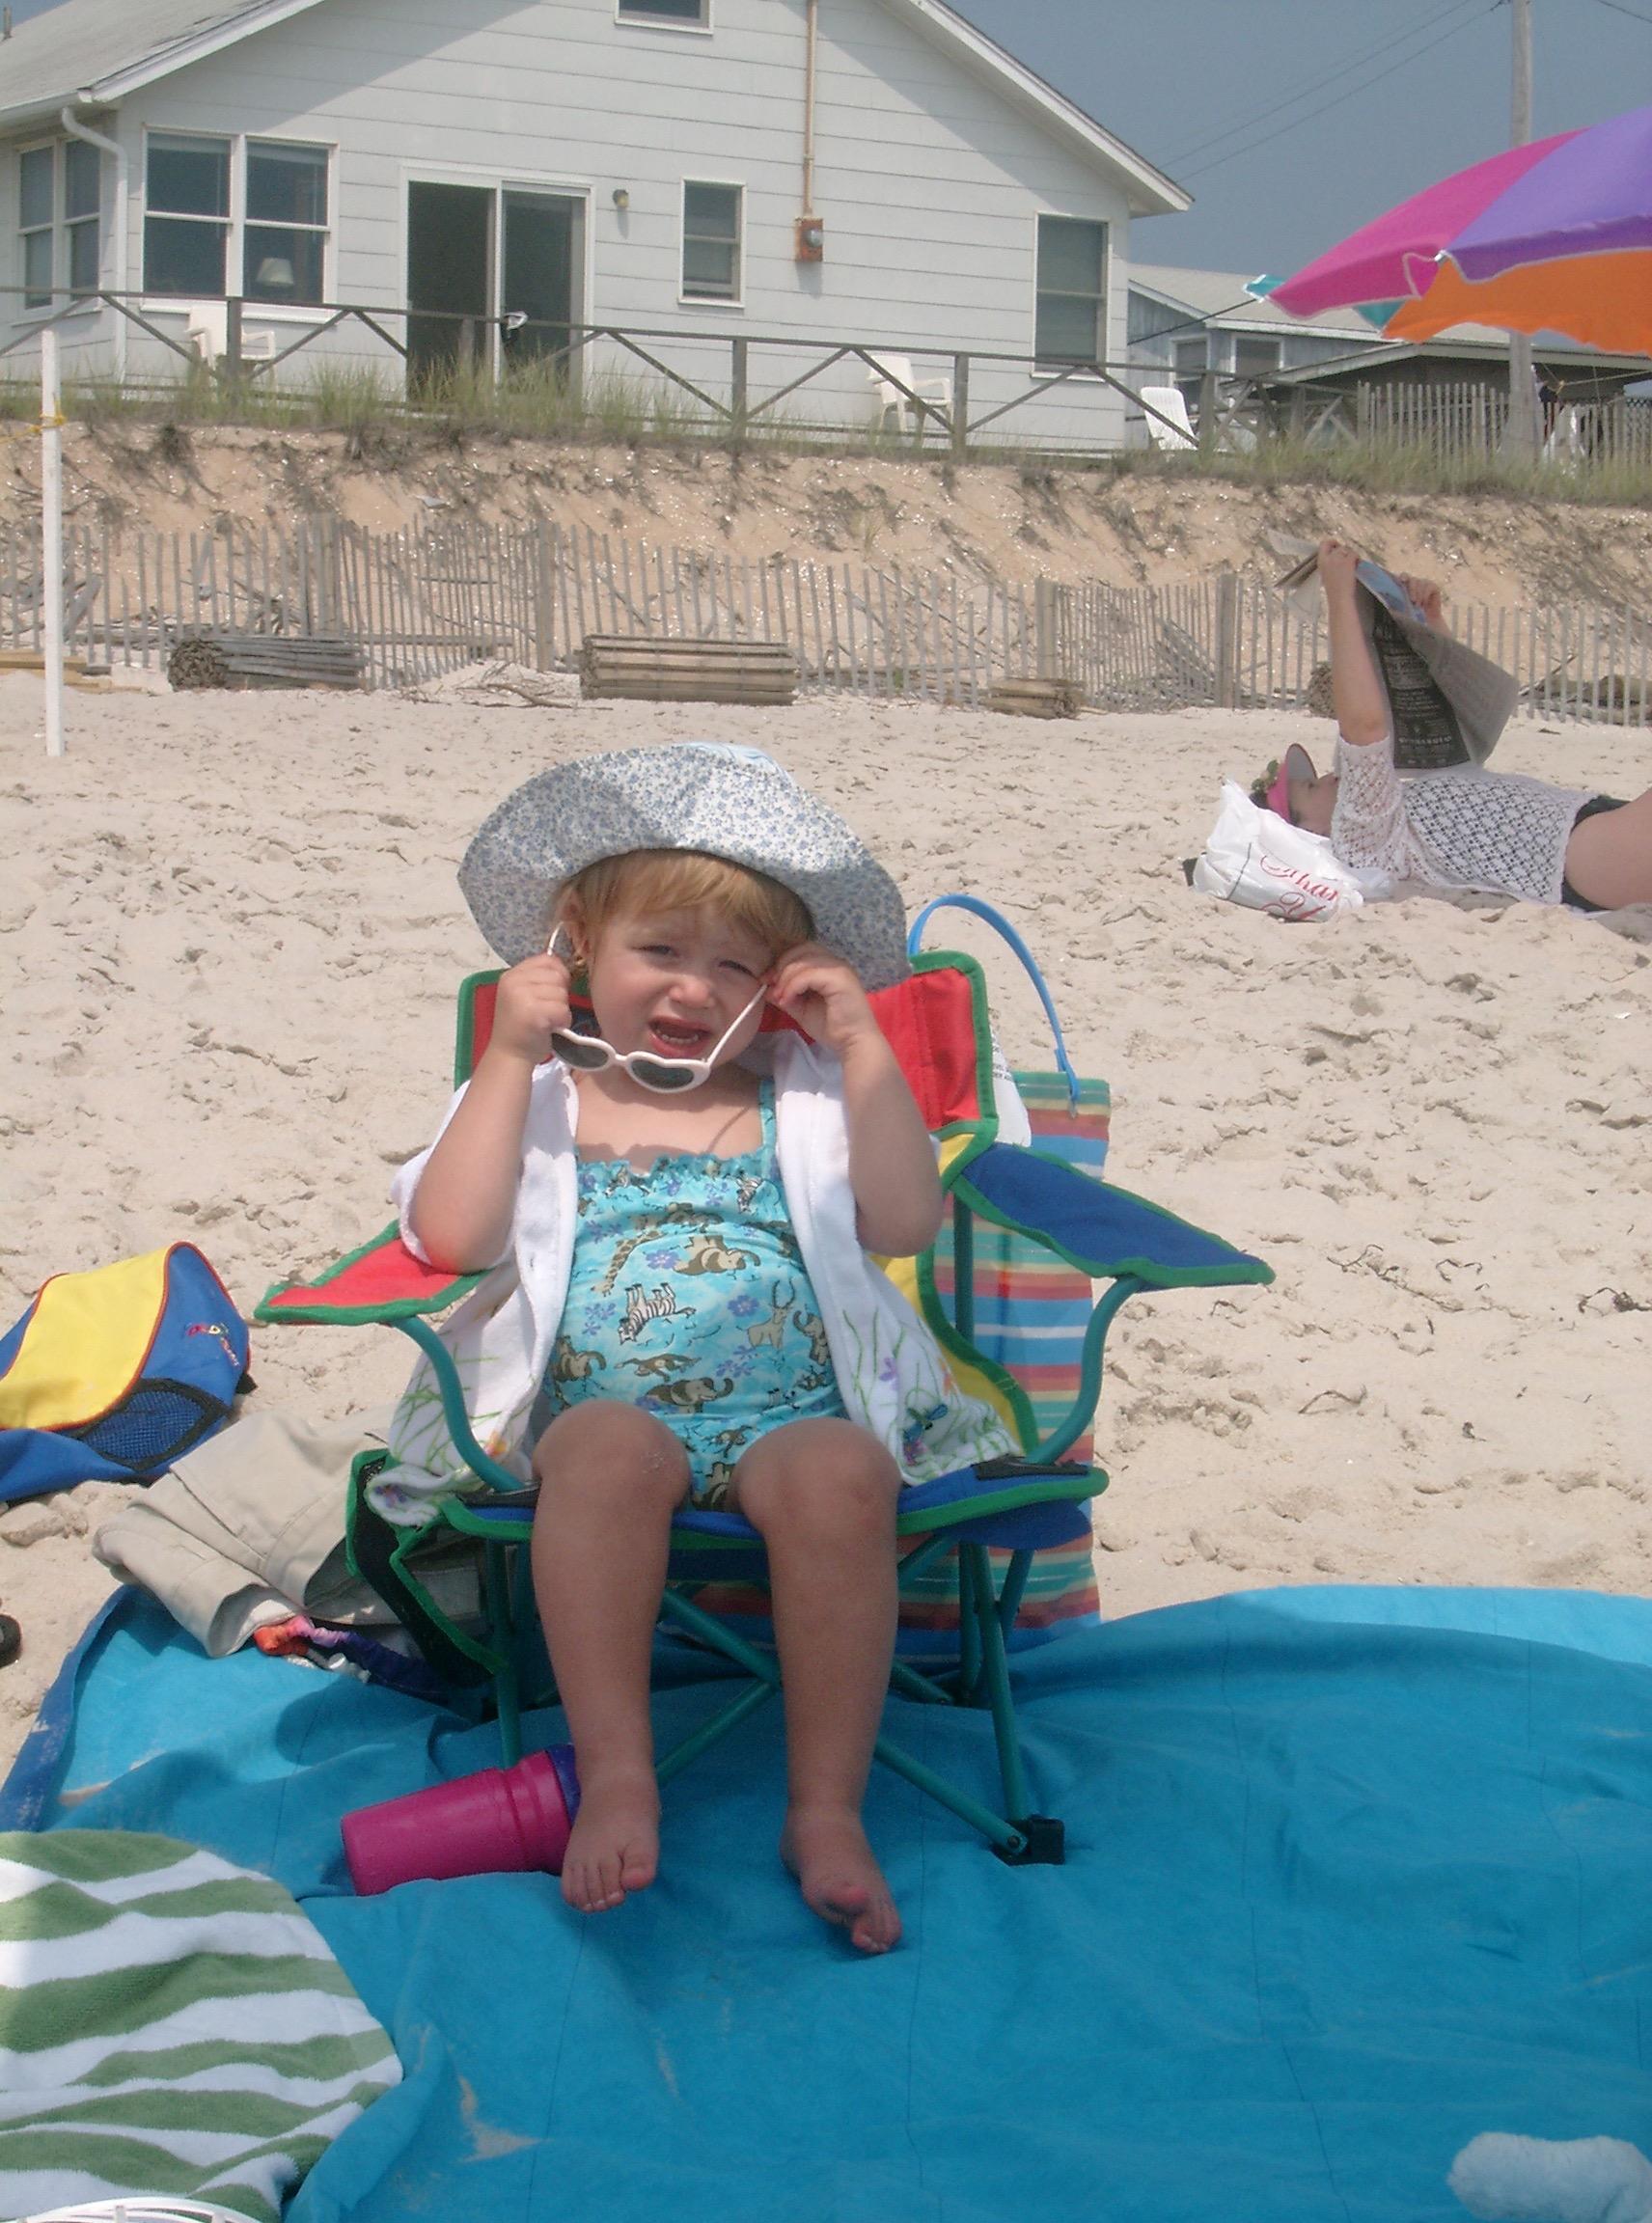 Me being sassy & my bangs in 2003